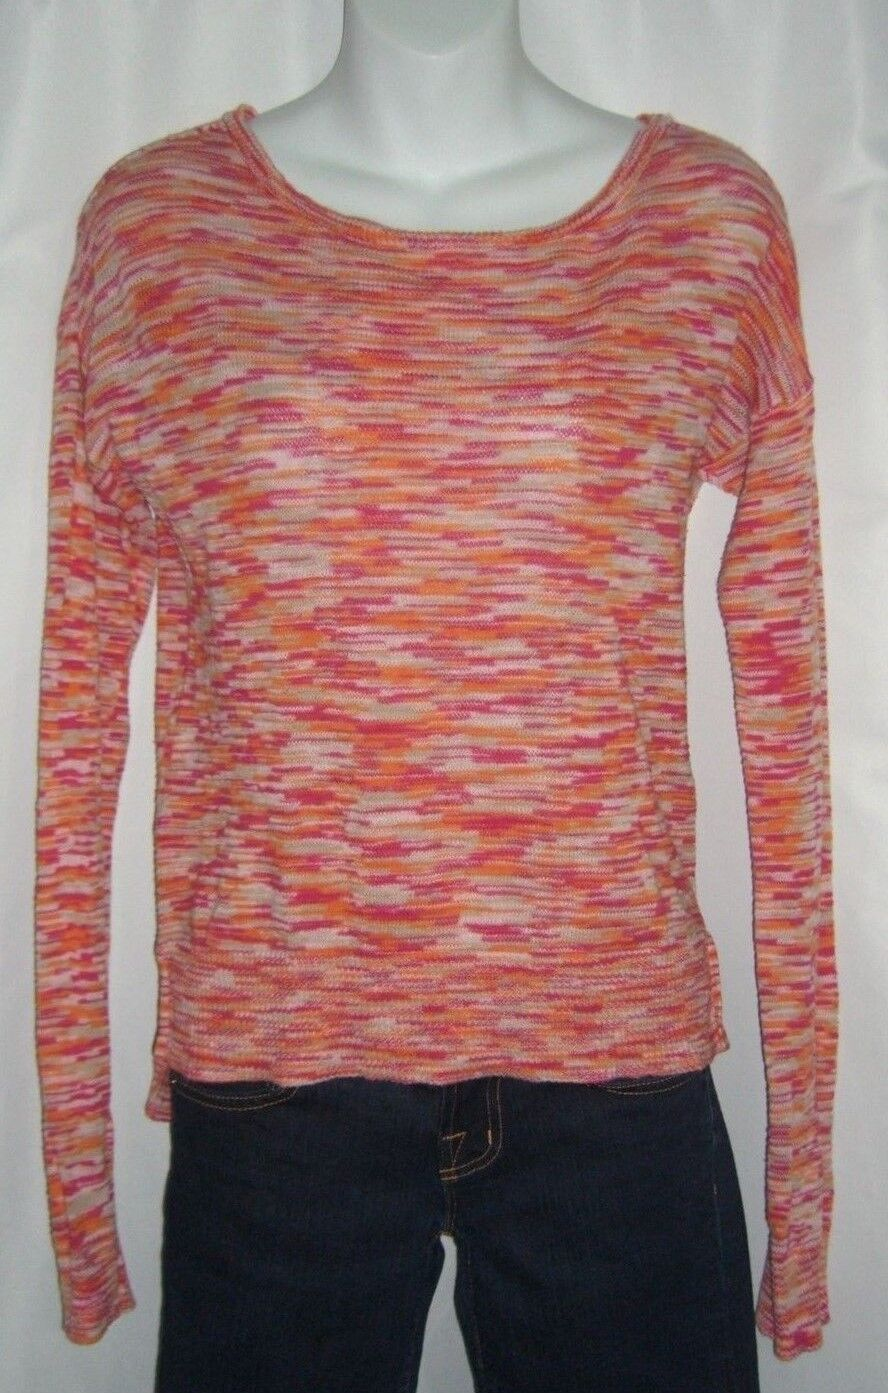 5b2a0c7c C & C California Sweater Striped orange Pink Beach Boho Bohemian Cotton  Boxy S